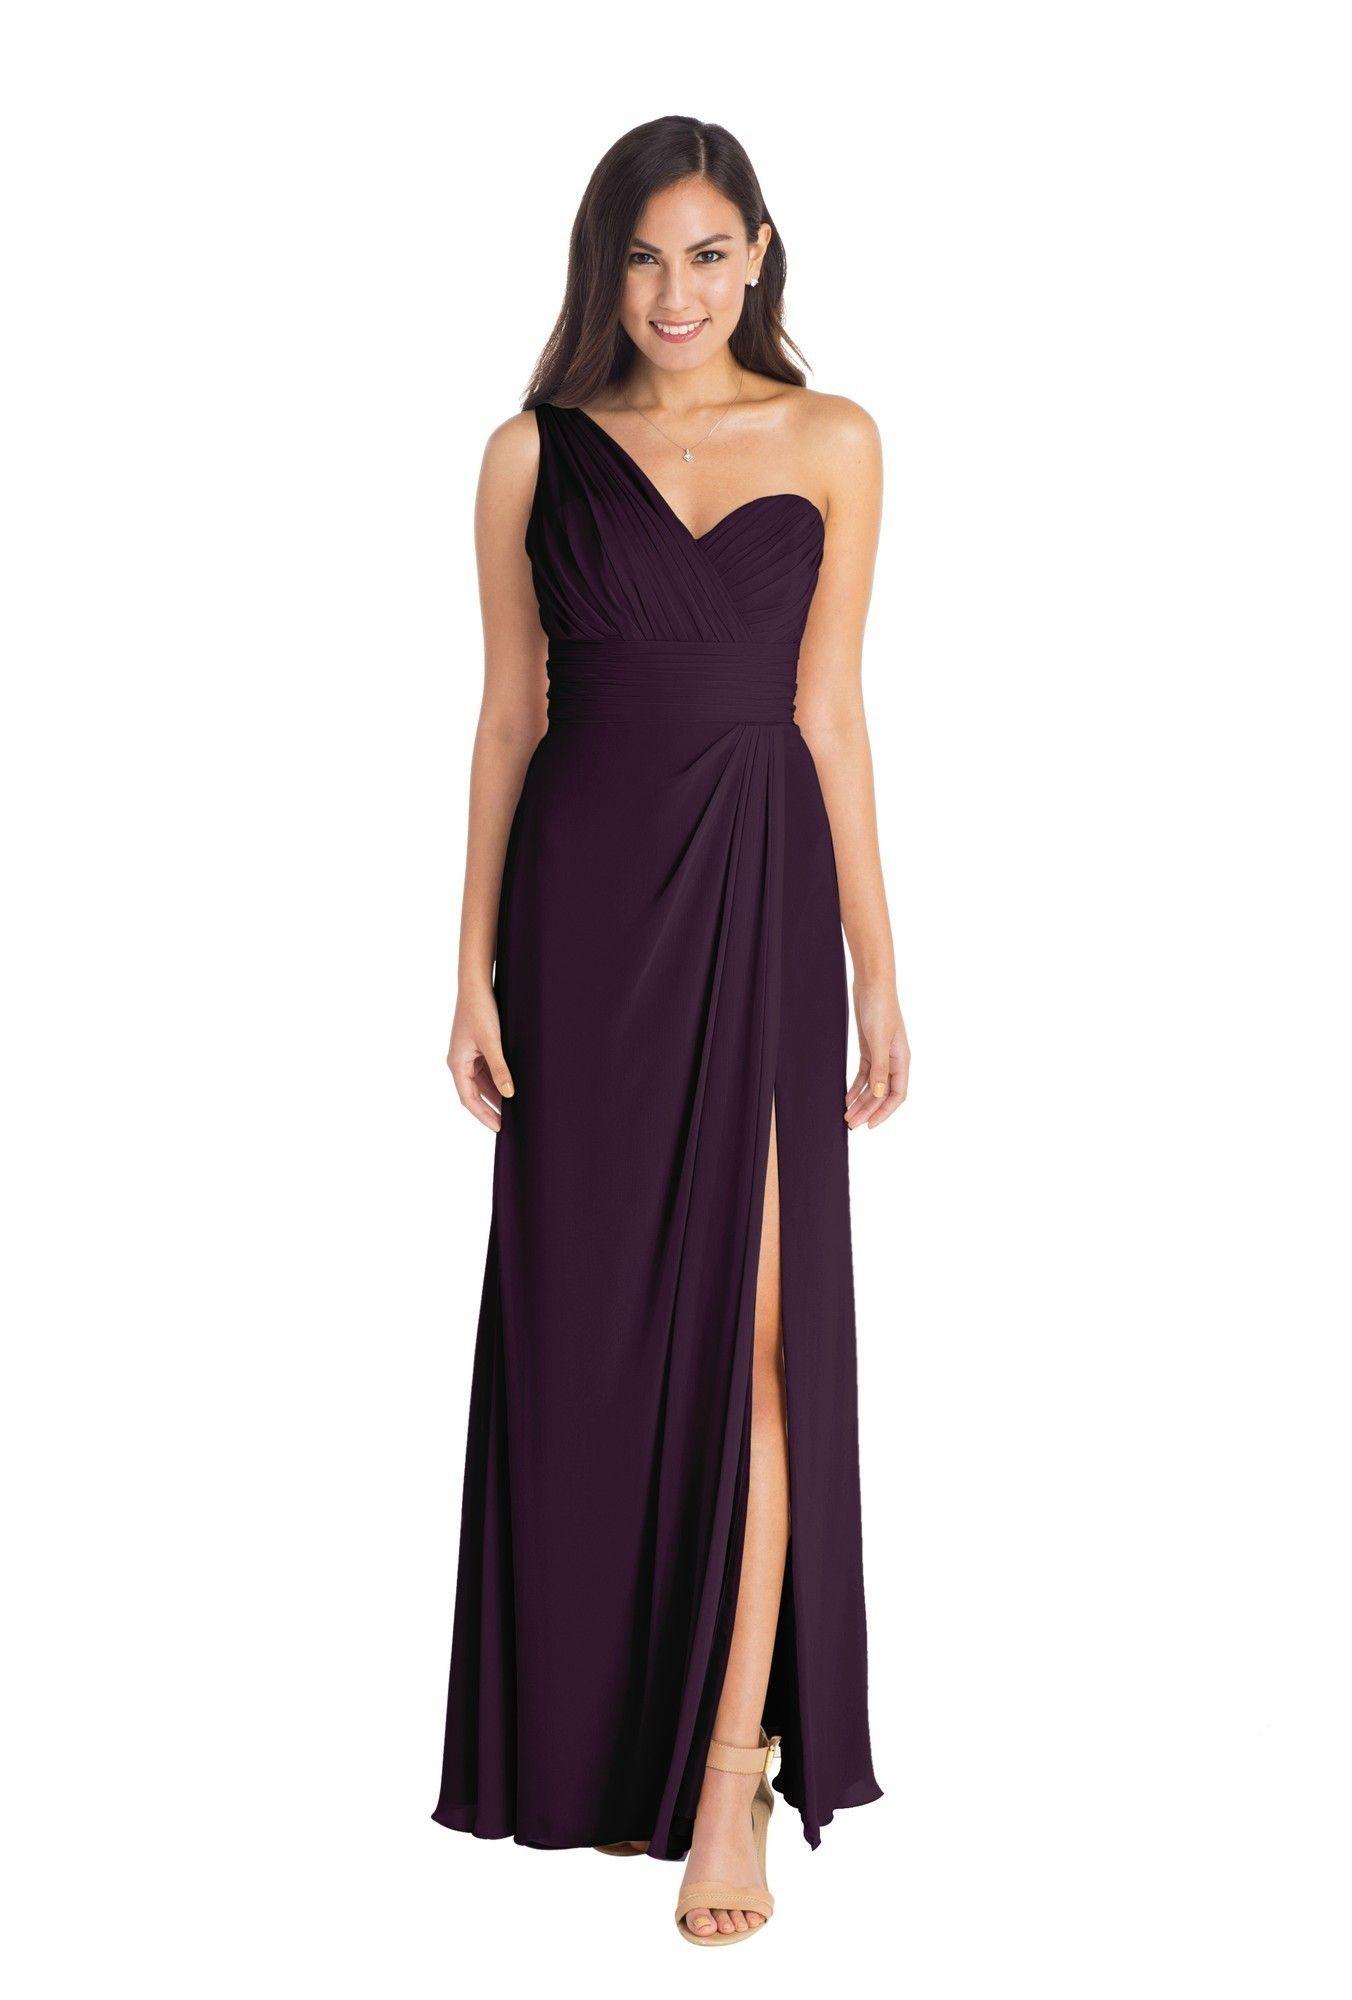 One side strap wedding dress  Watters Tulip  Floor length gown